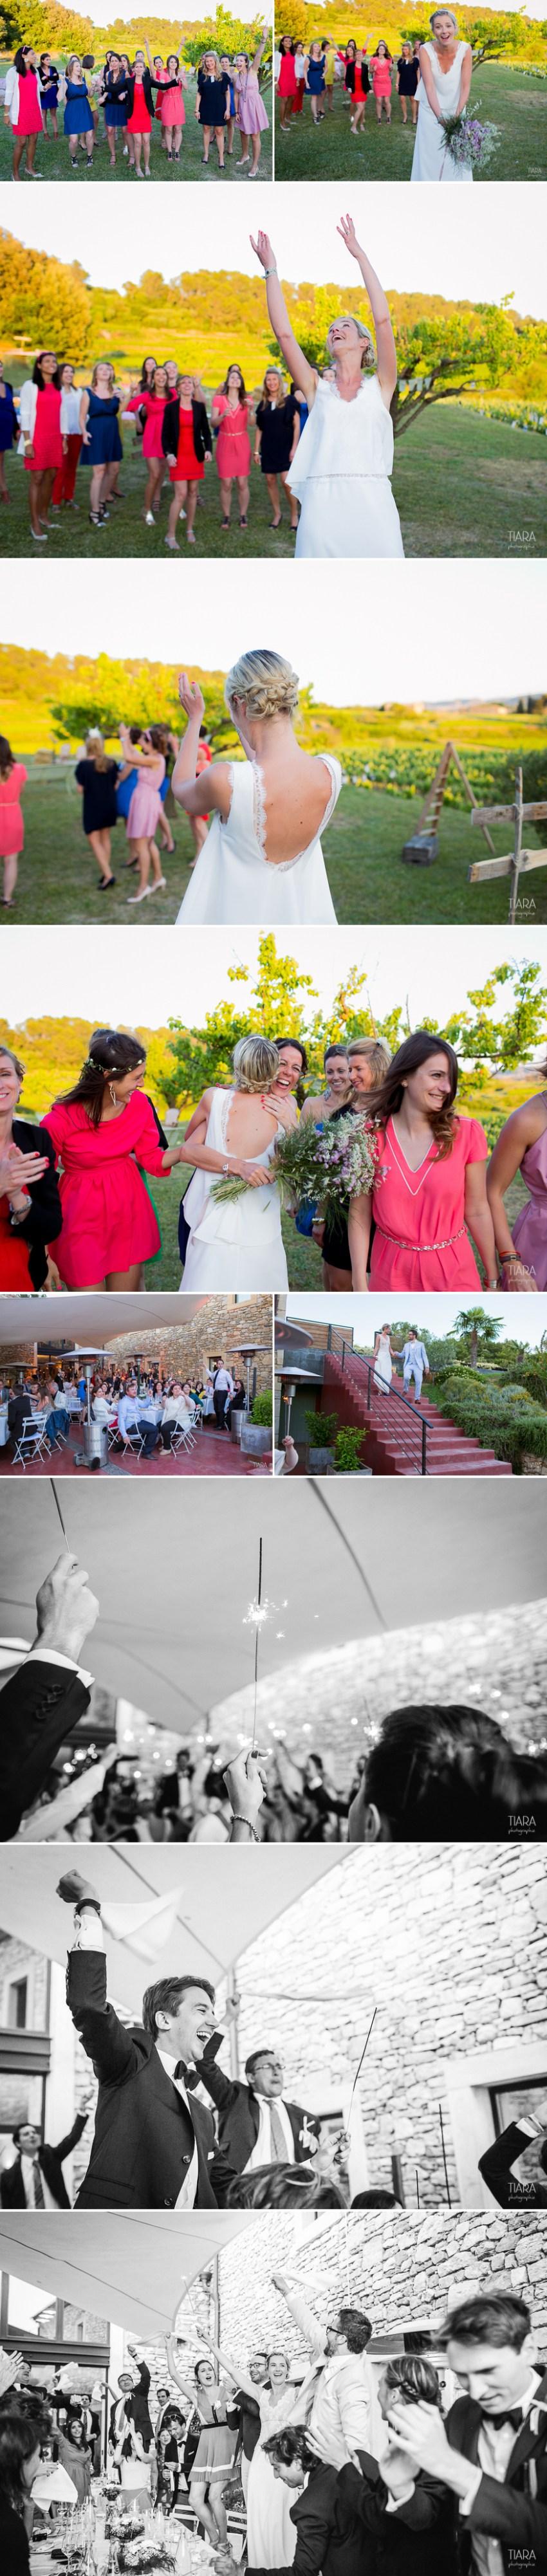 photographe mariage sud de france